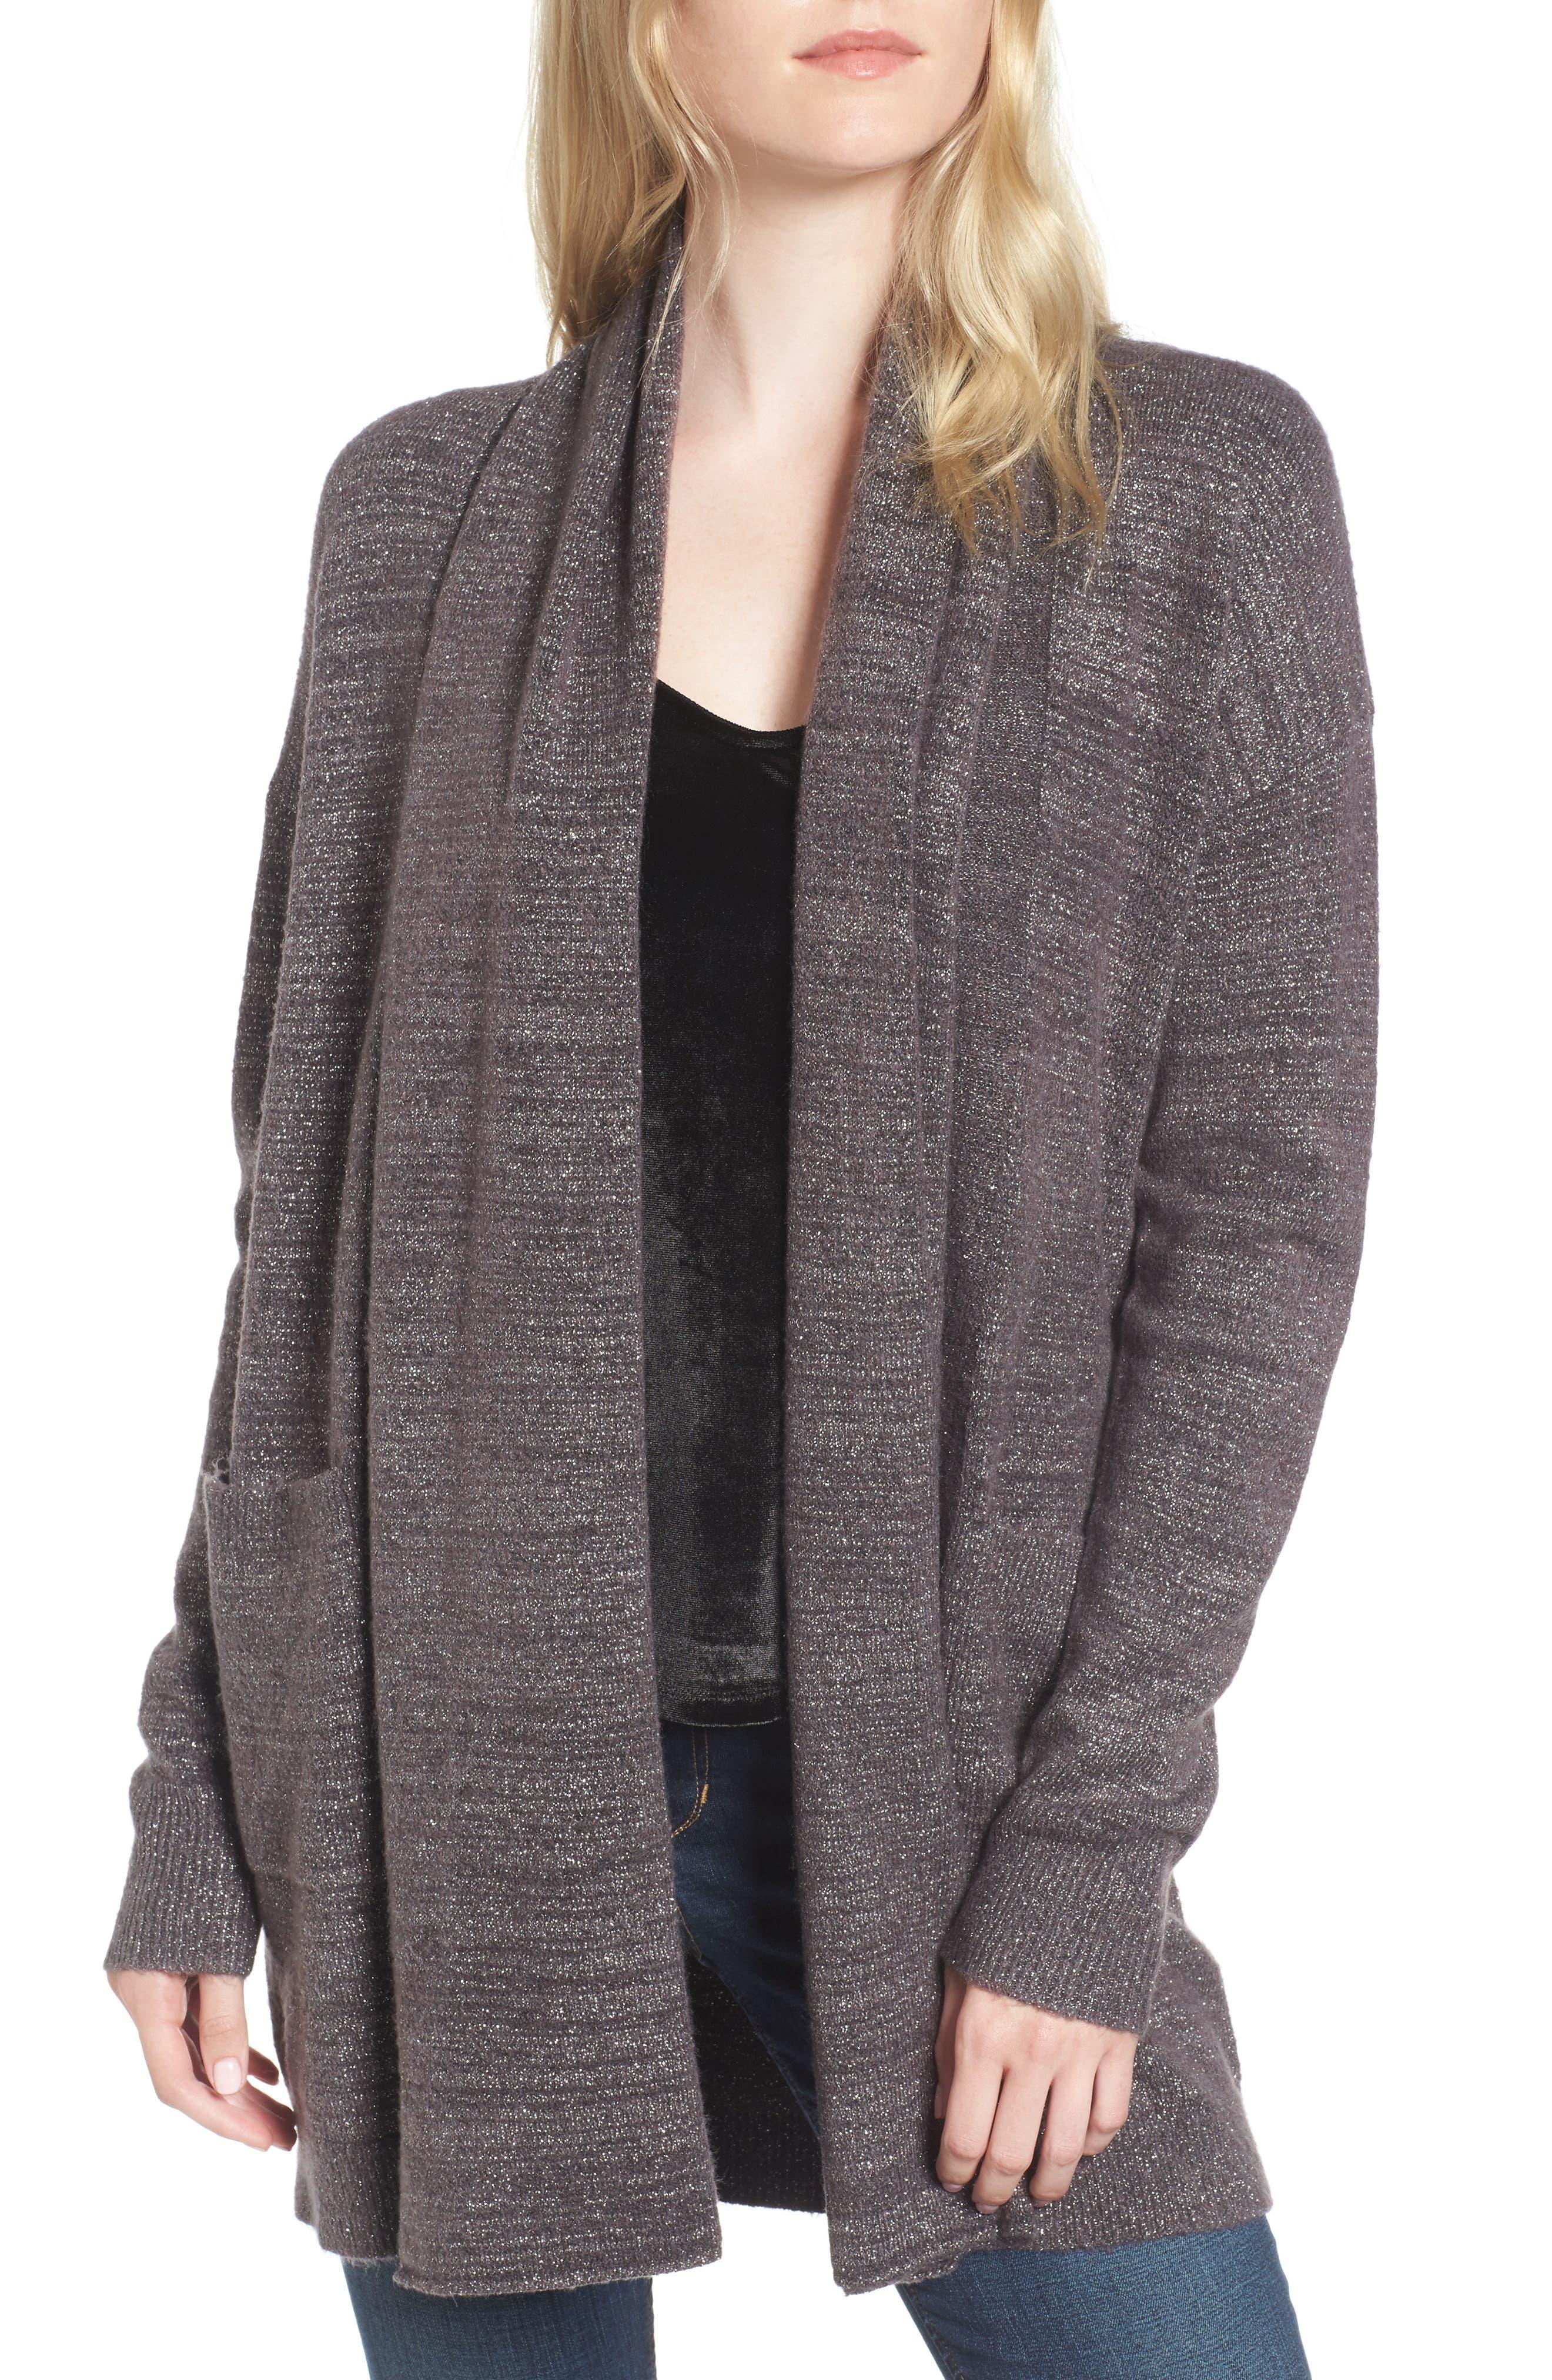 Hinge Cardigan Sweater